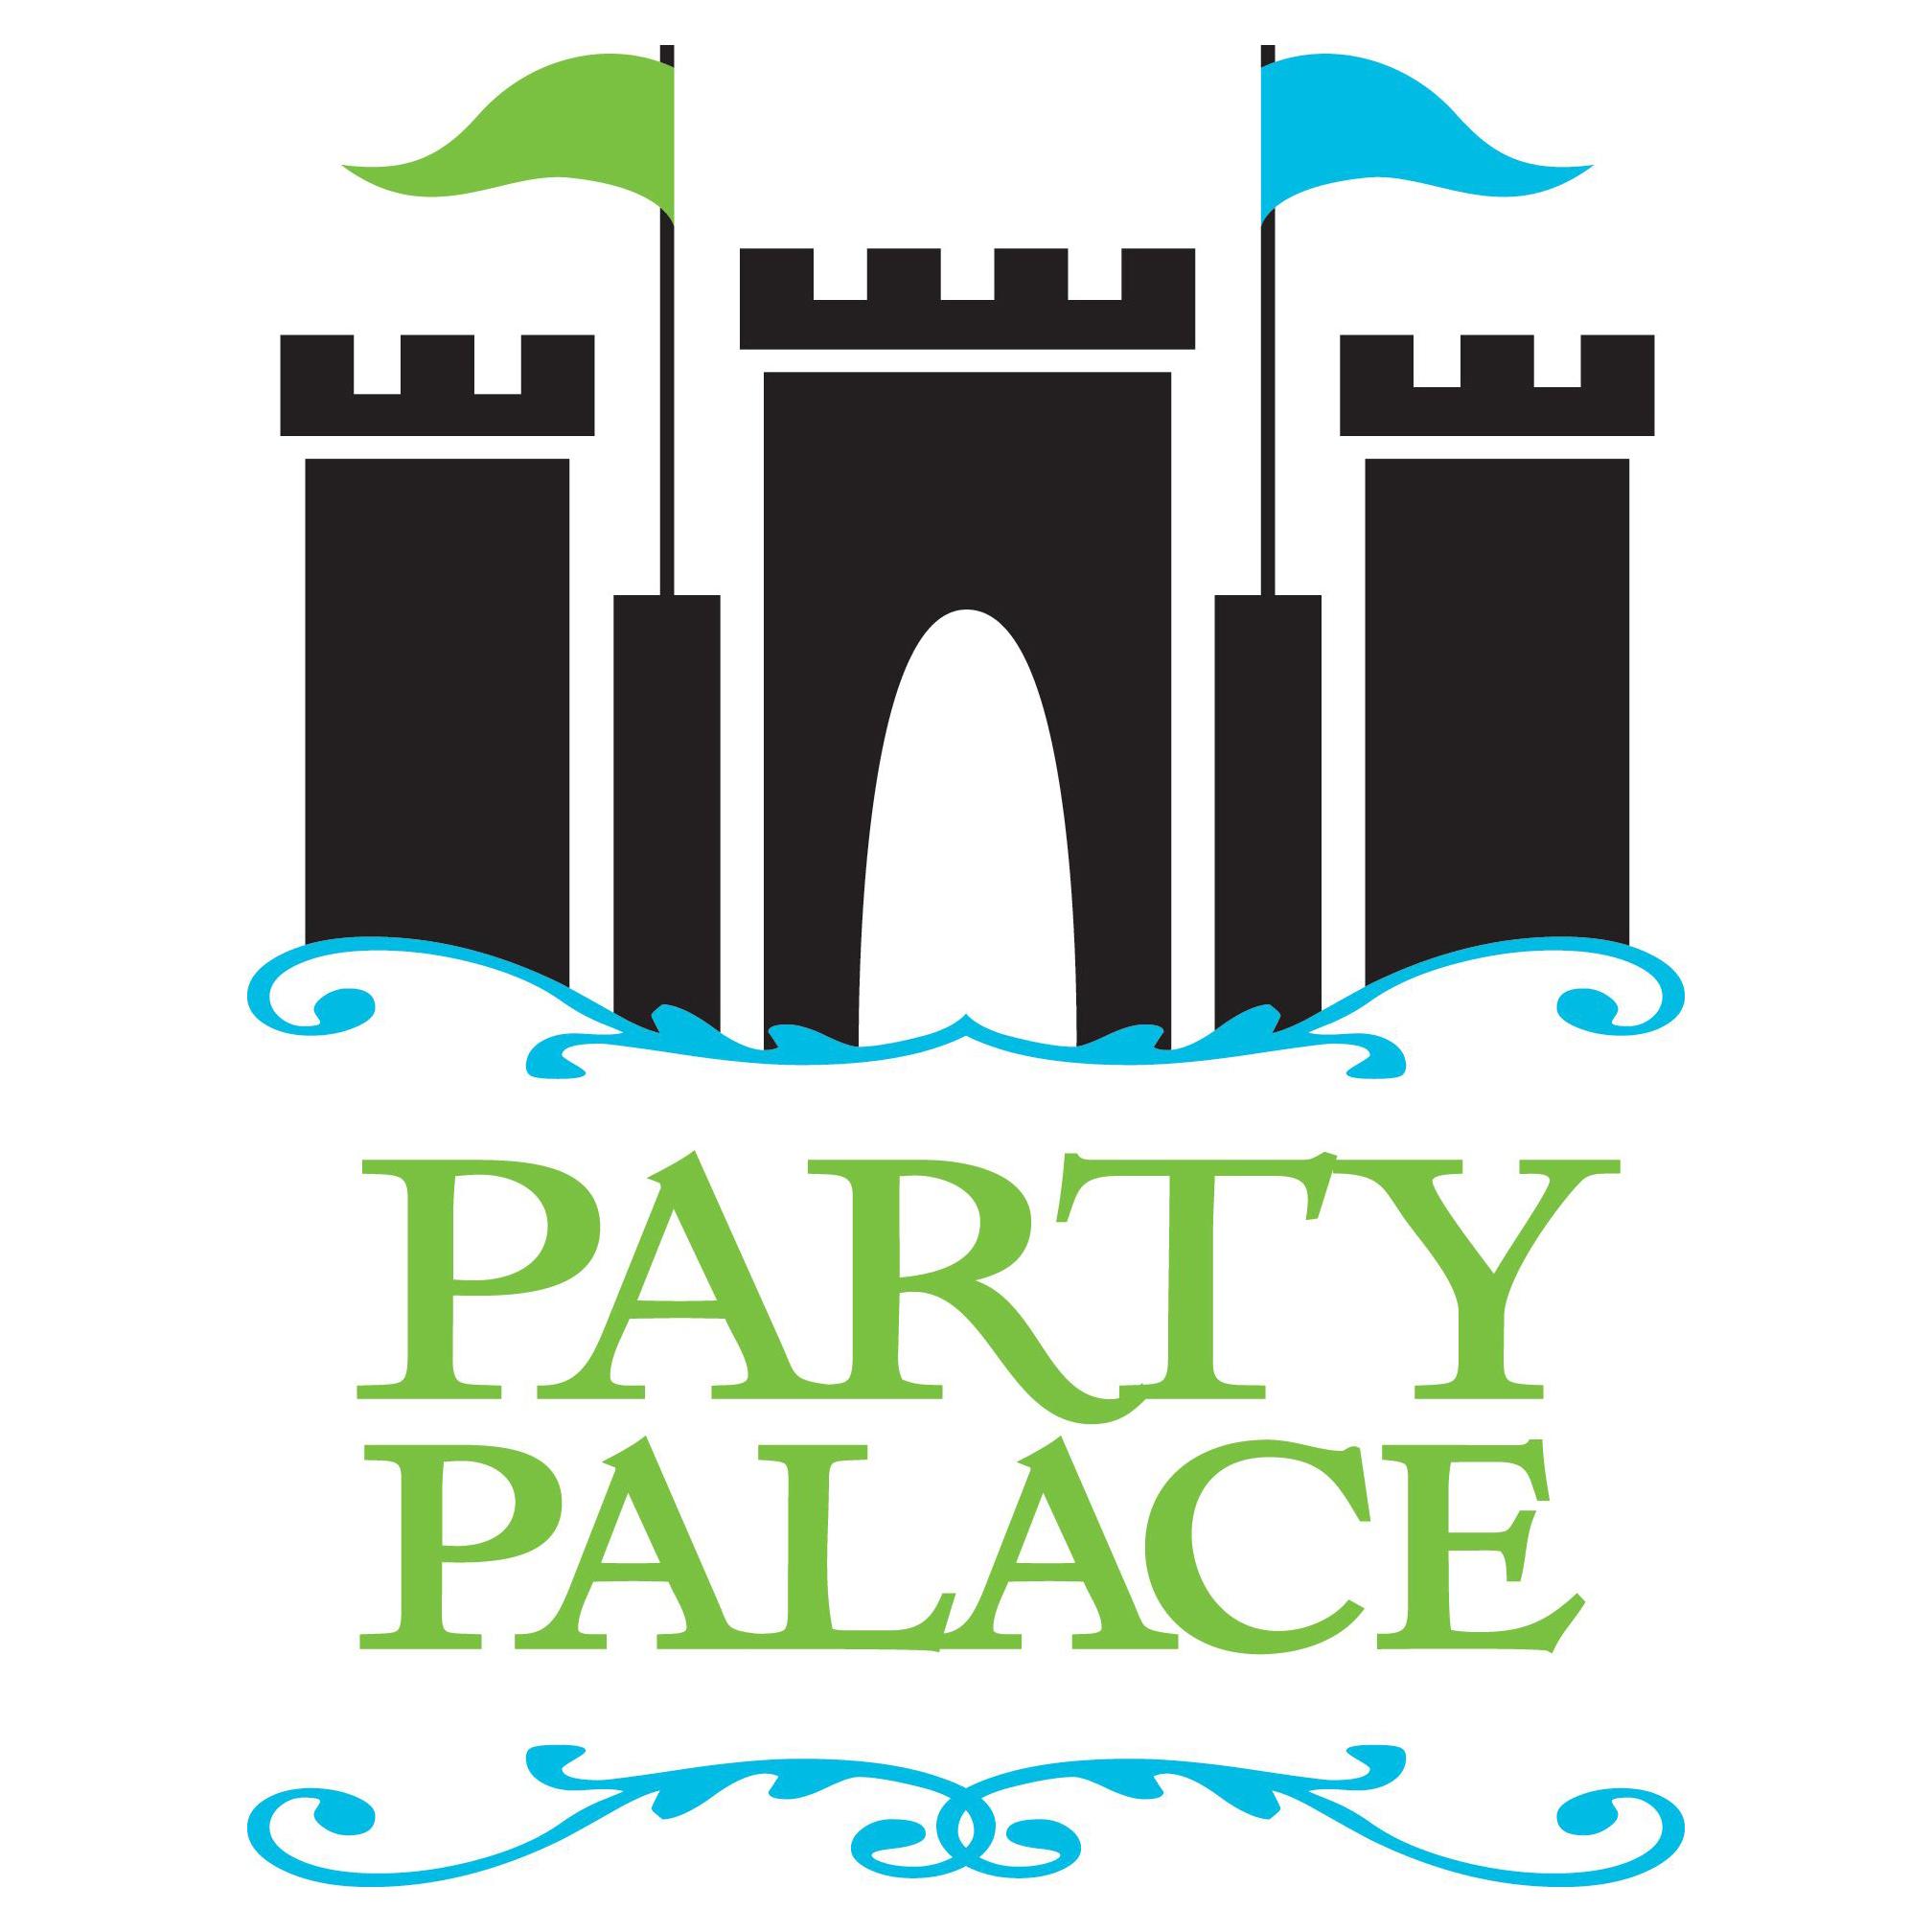 Party Palace Logo